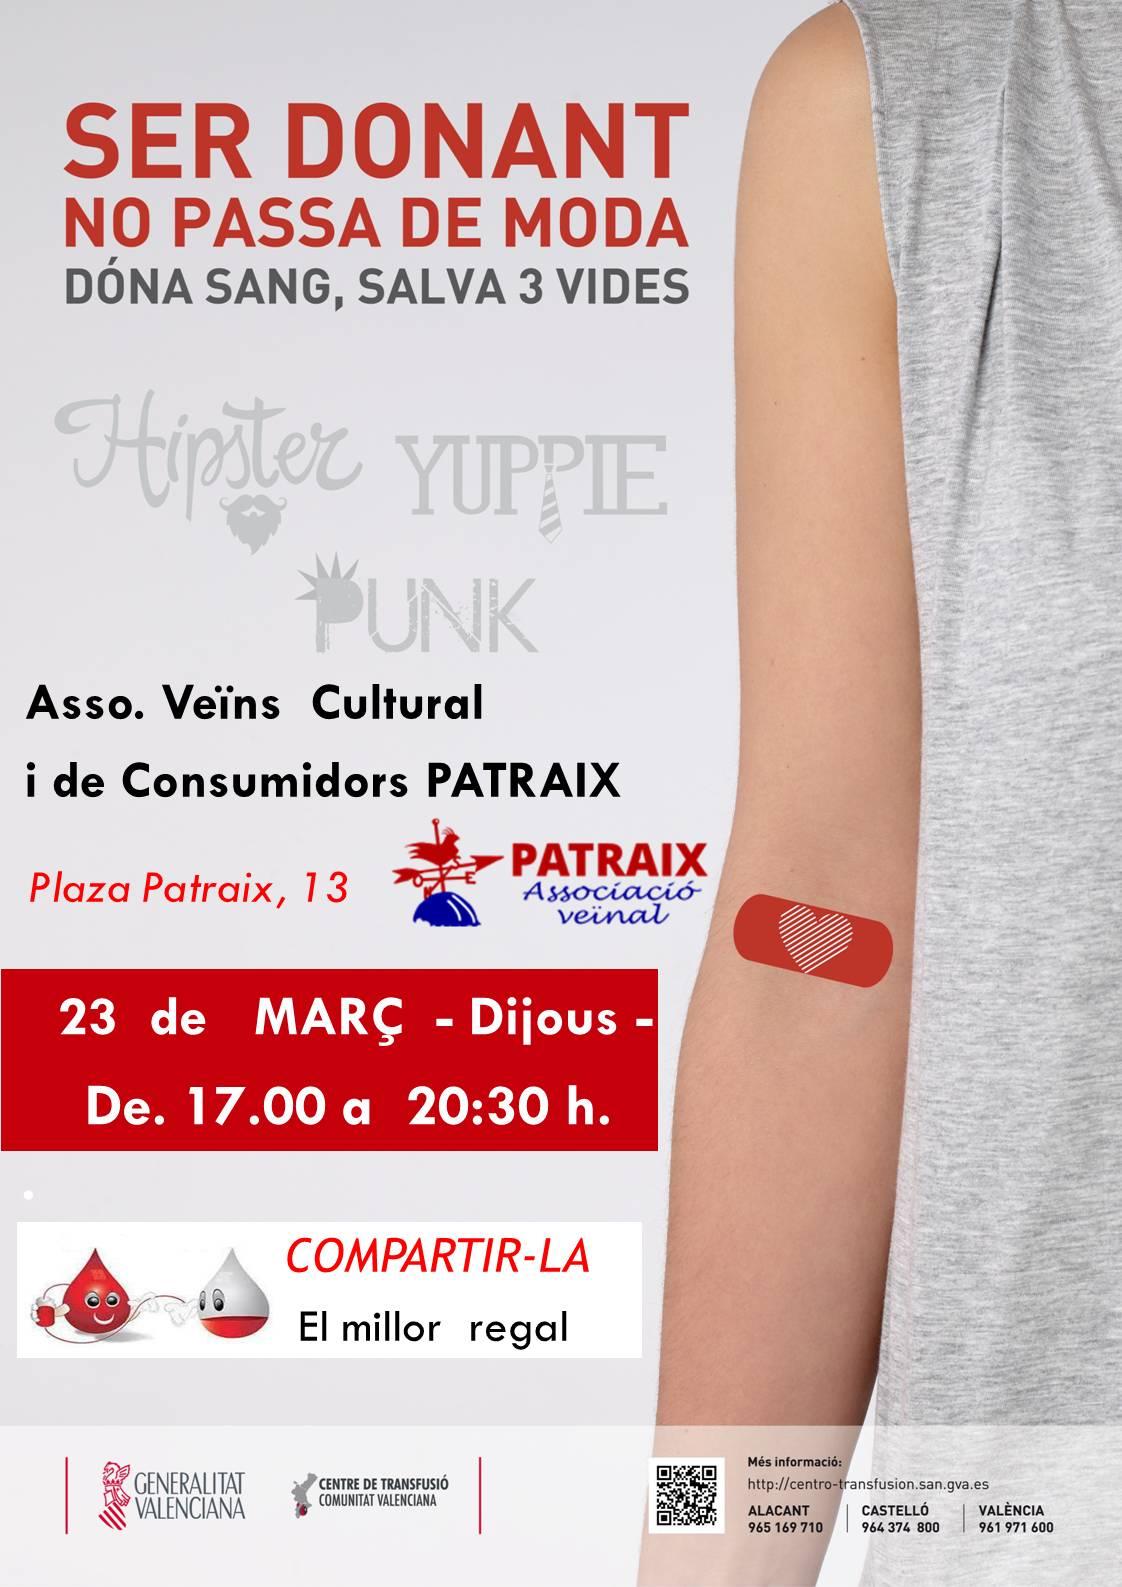 Donación de sangre 23/03/17